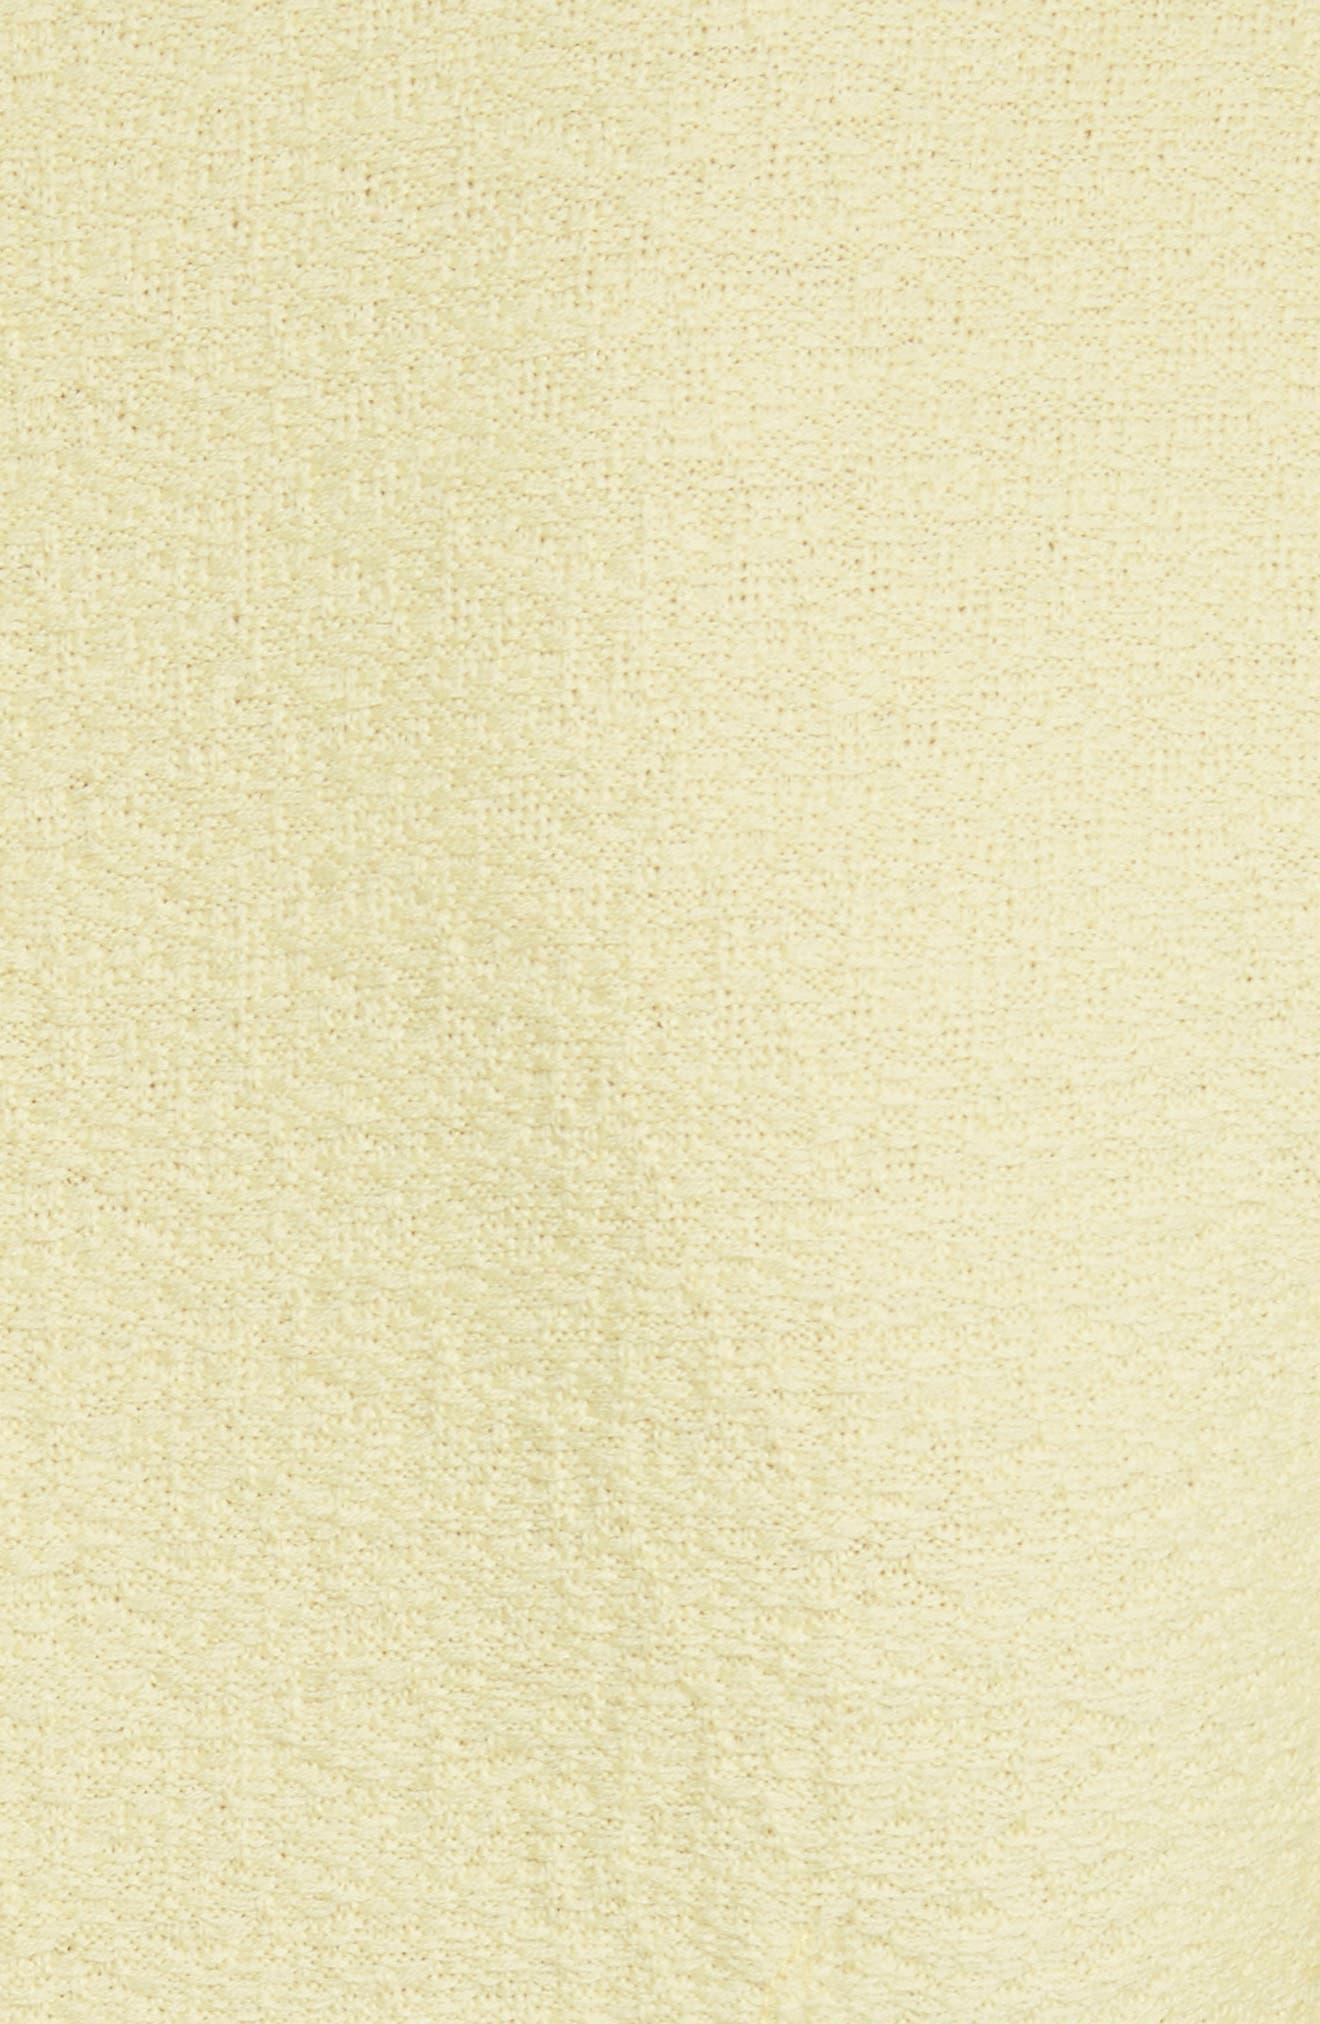 Hannah Knit Asymmetrical Sheath Dress,                             Alternate thumbnail 6, color,                             Citron